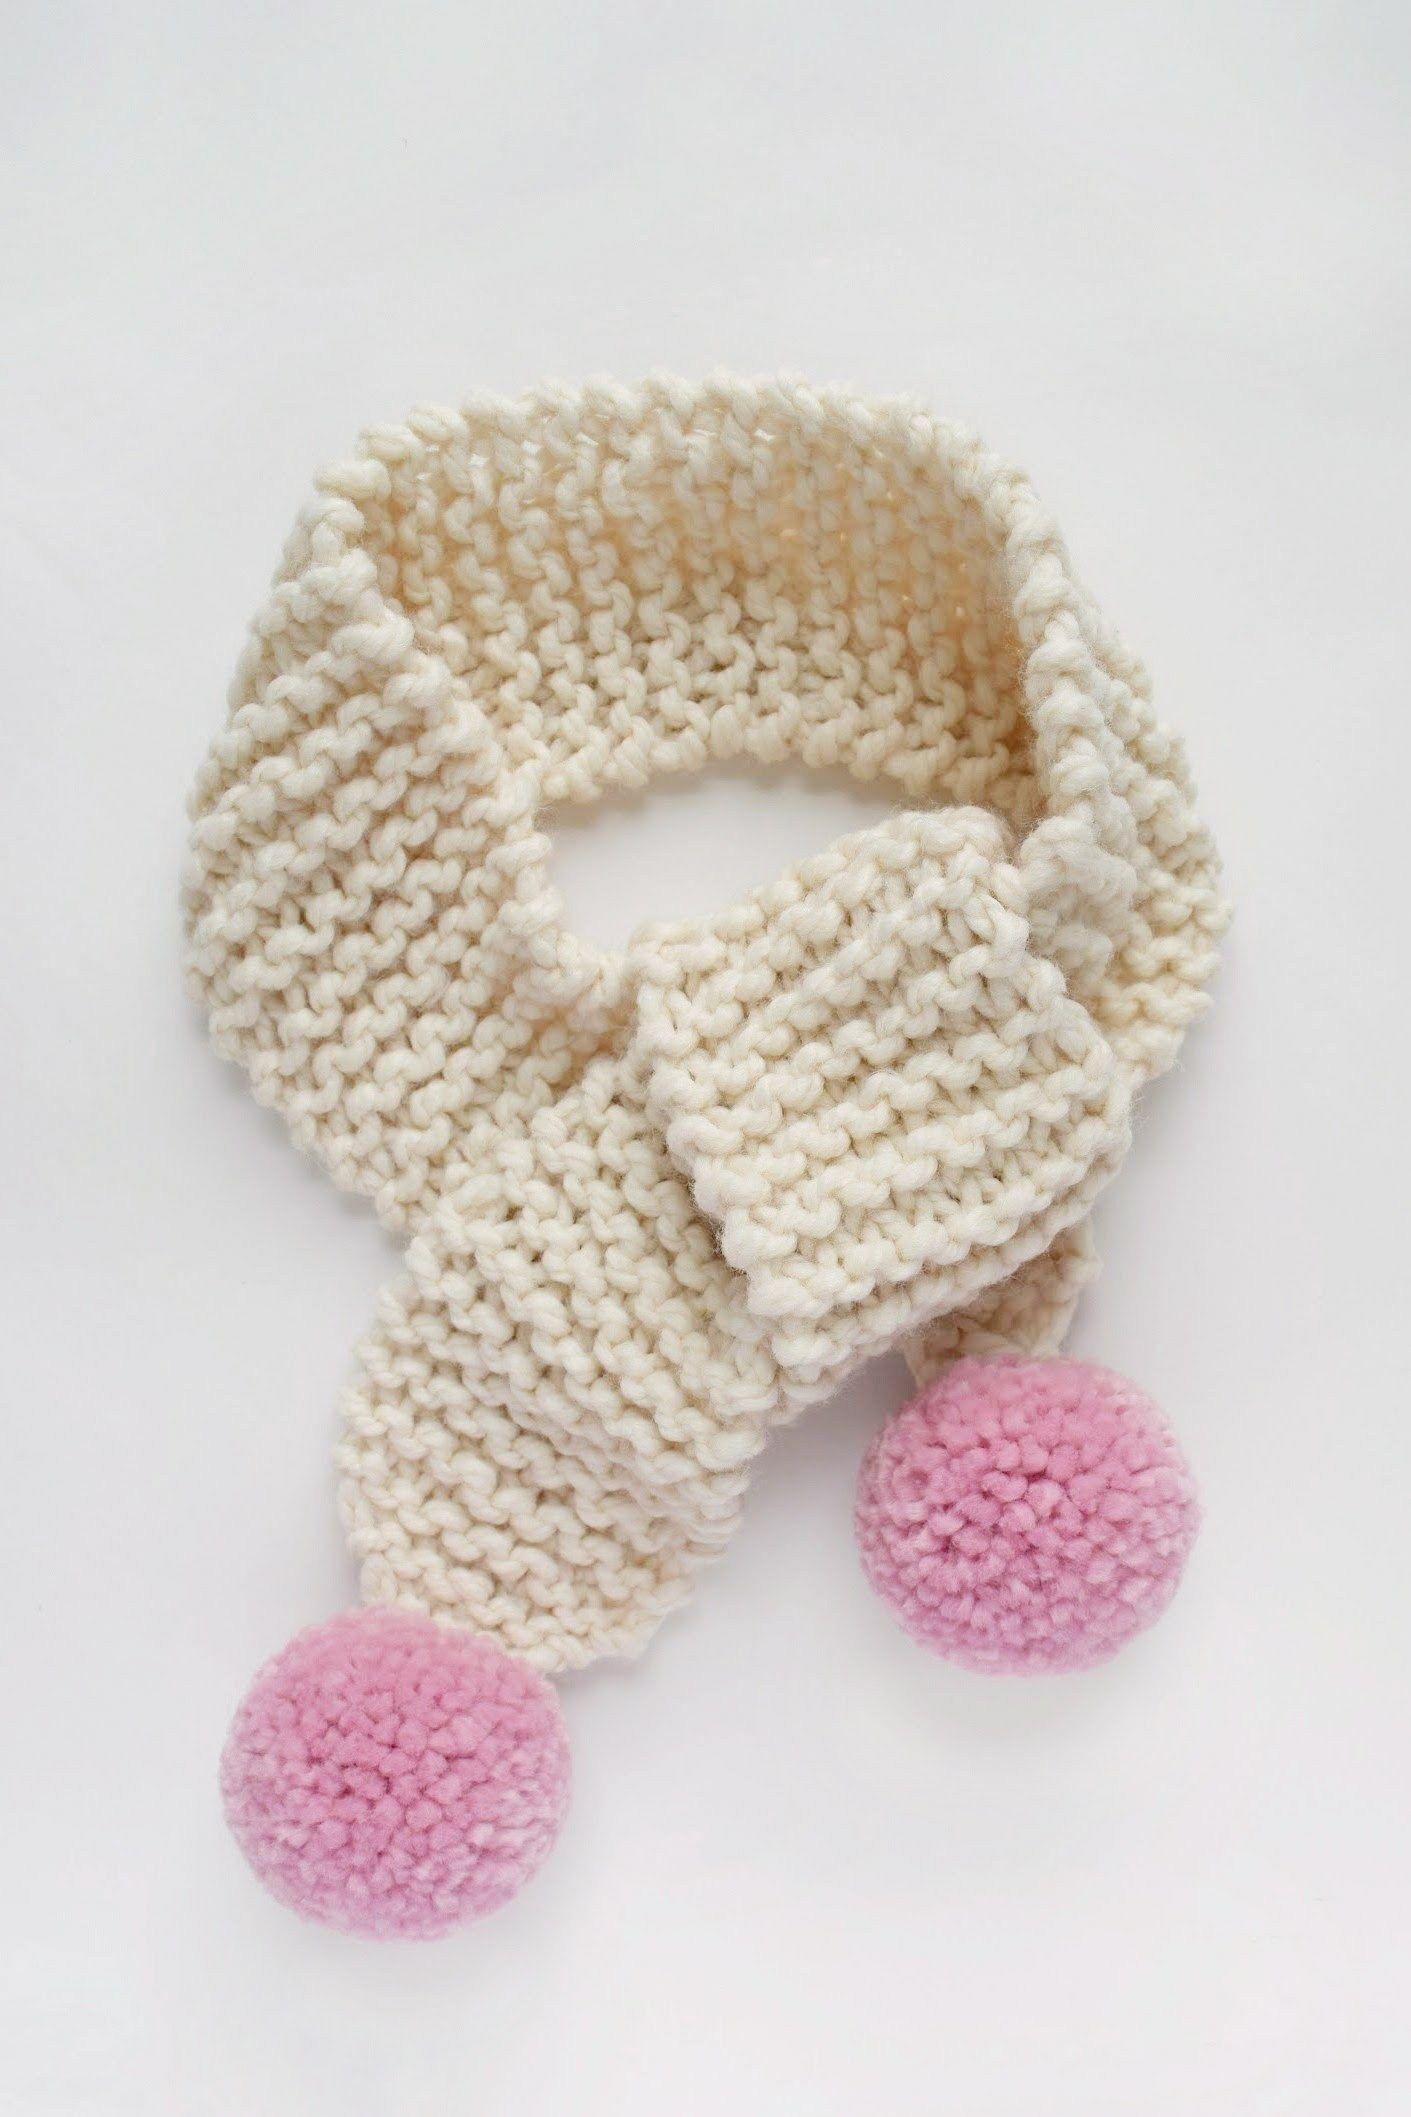 Knit Pom Pom Scarf Pattern - for Kiddos | Kids knitting ...